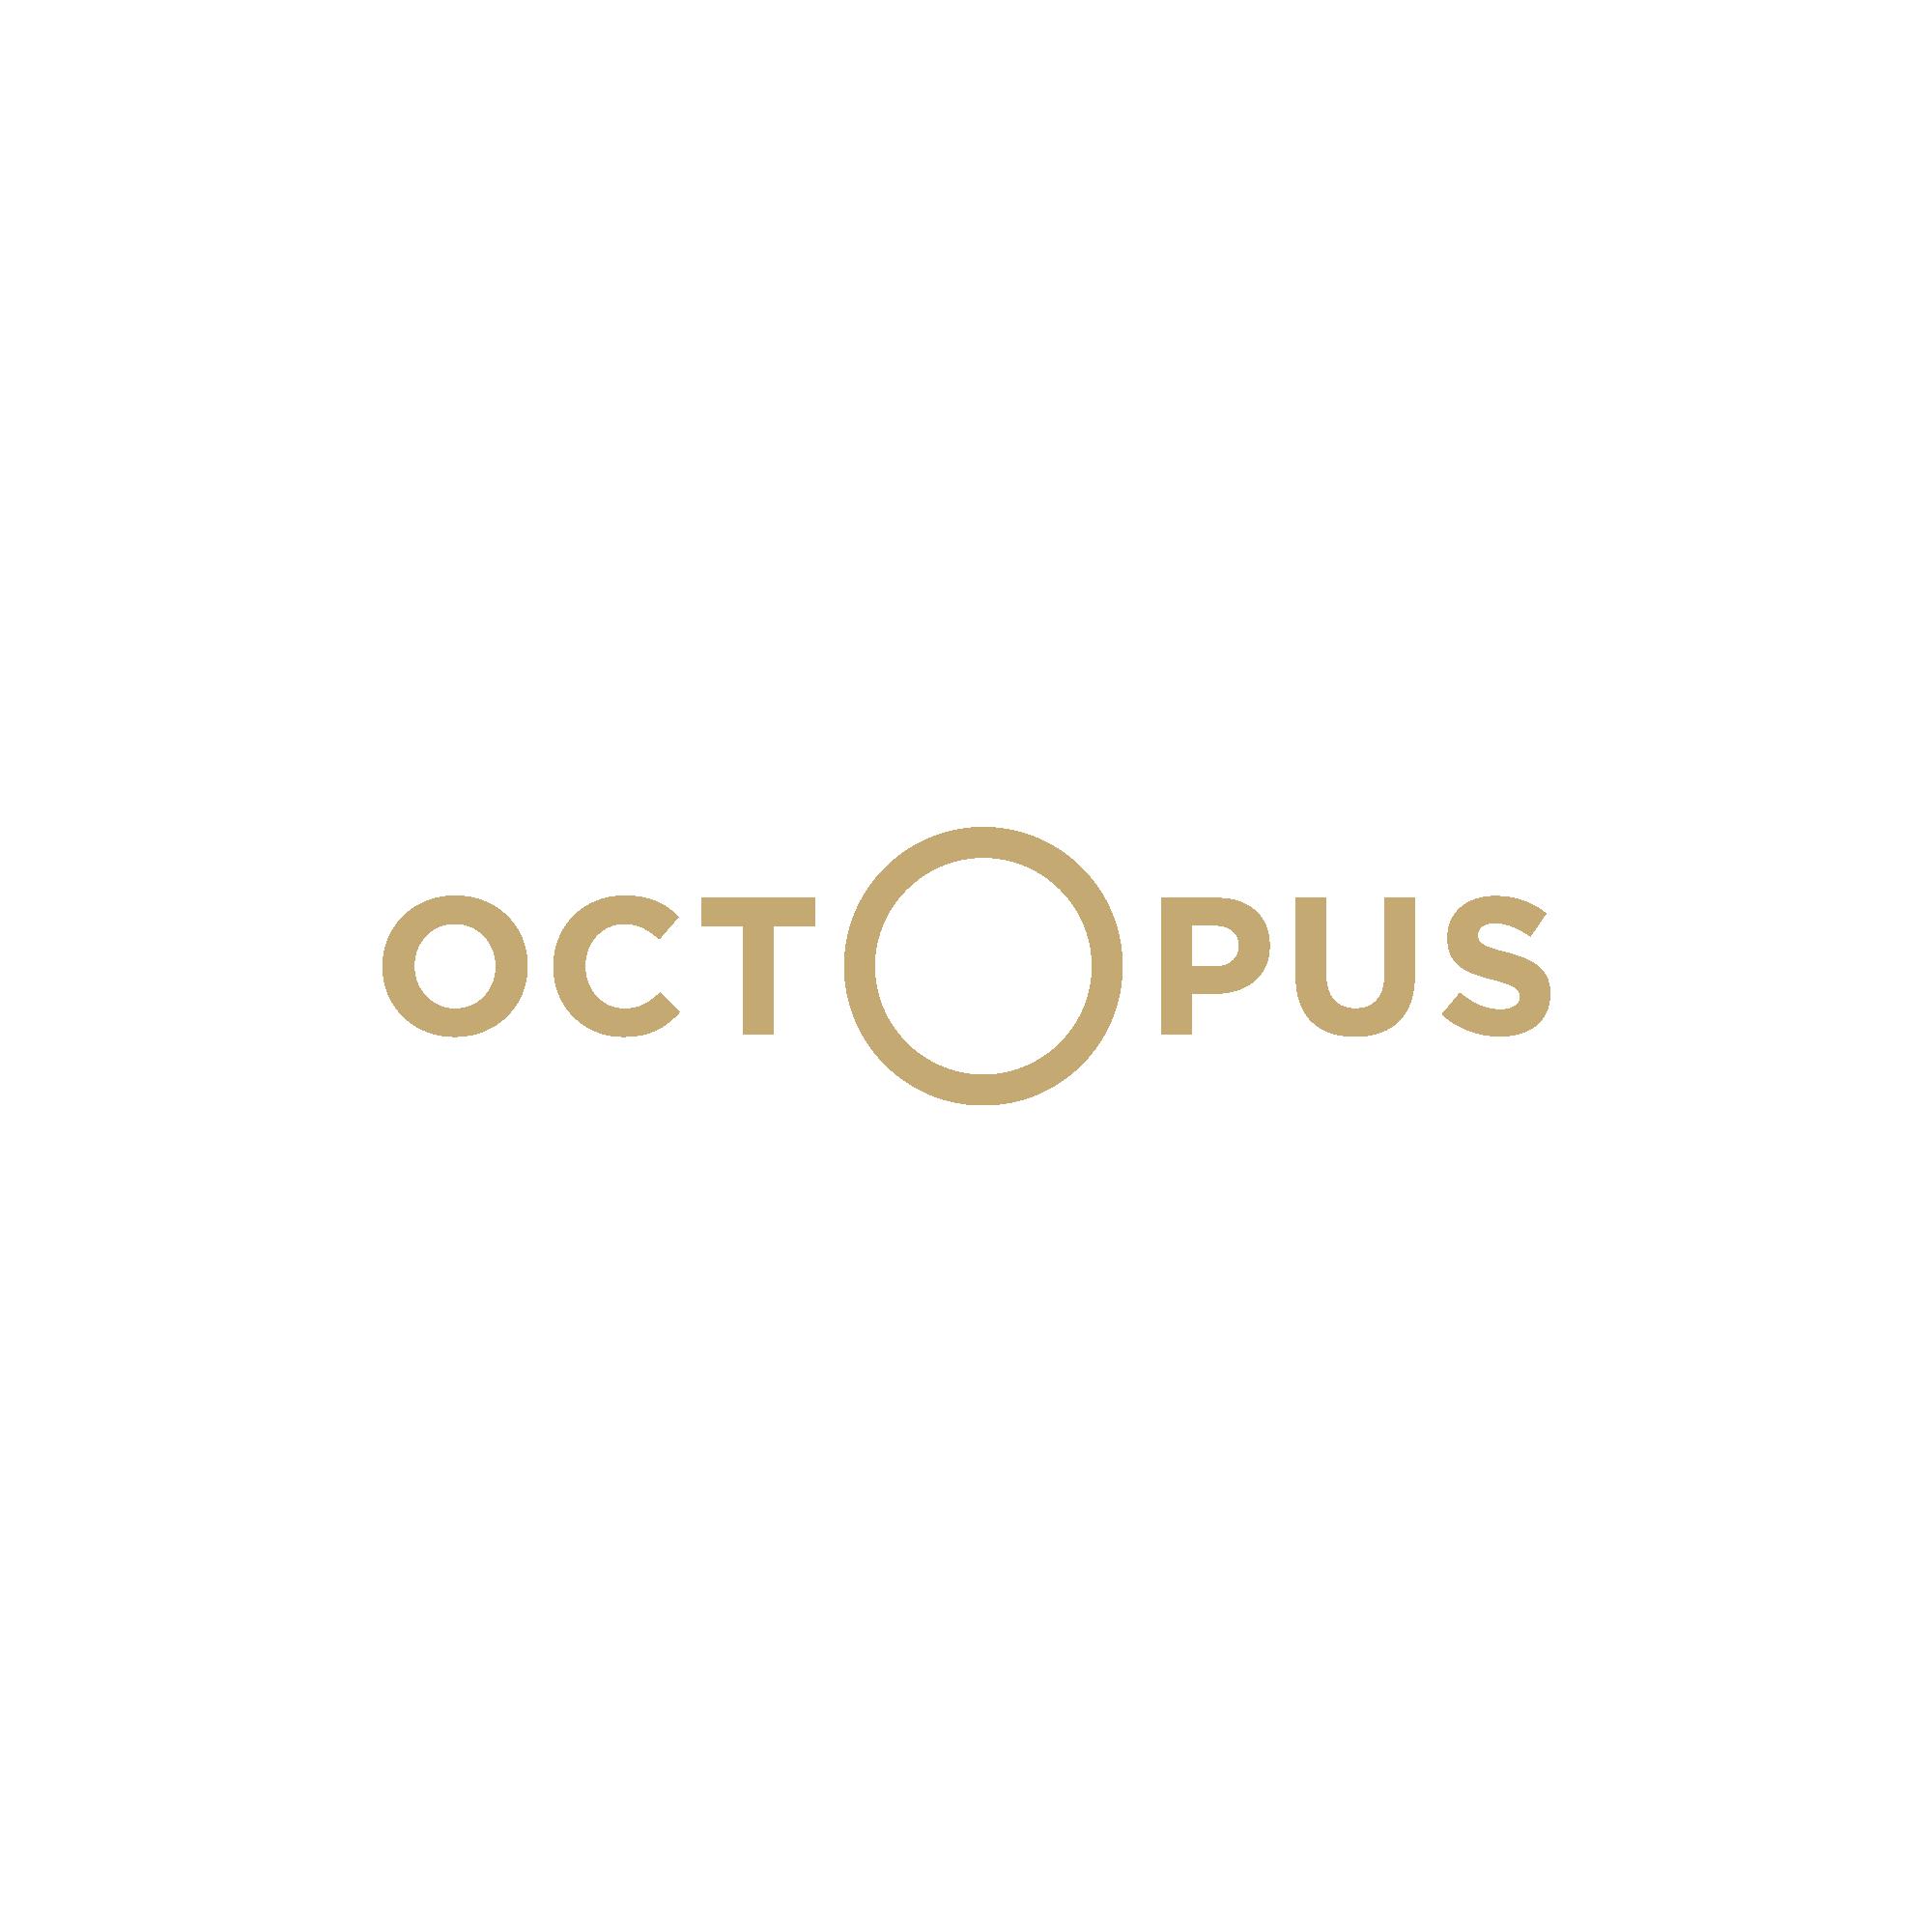 Libraire Octopus – Josselin Tourette – Identite – 2